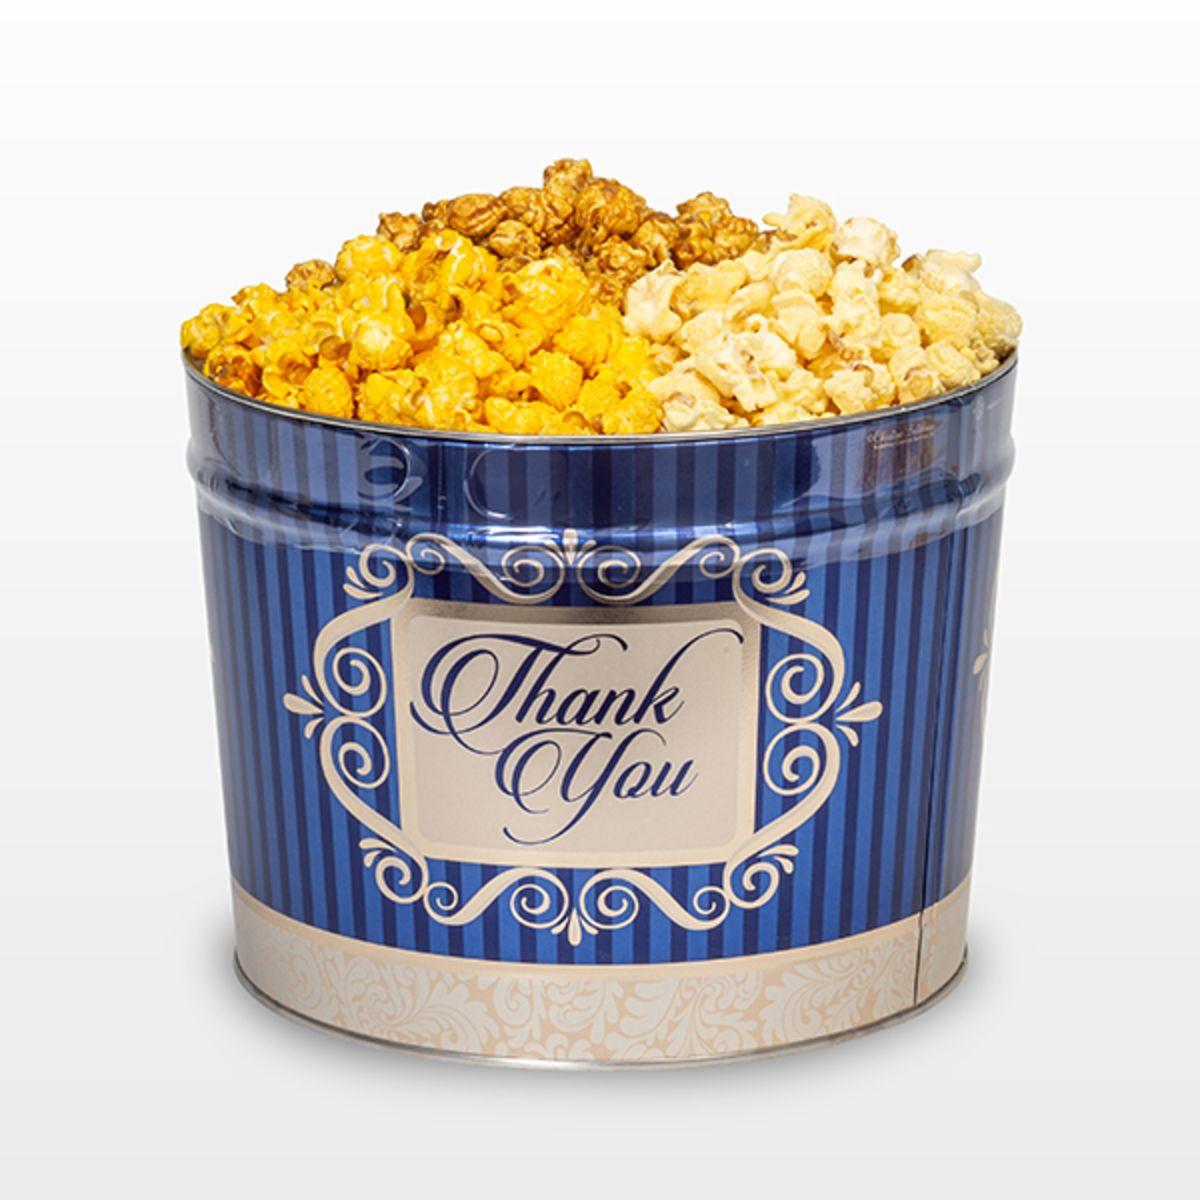 Pease's Triple Mix Popcorn, 2 Gallon Tin